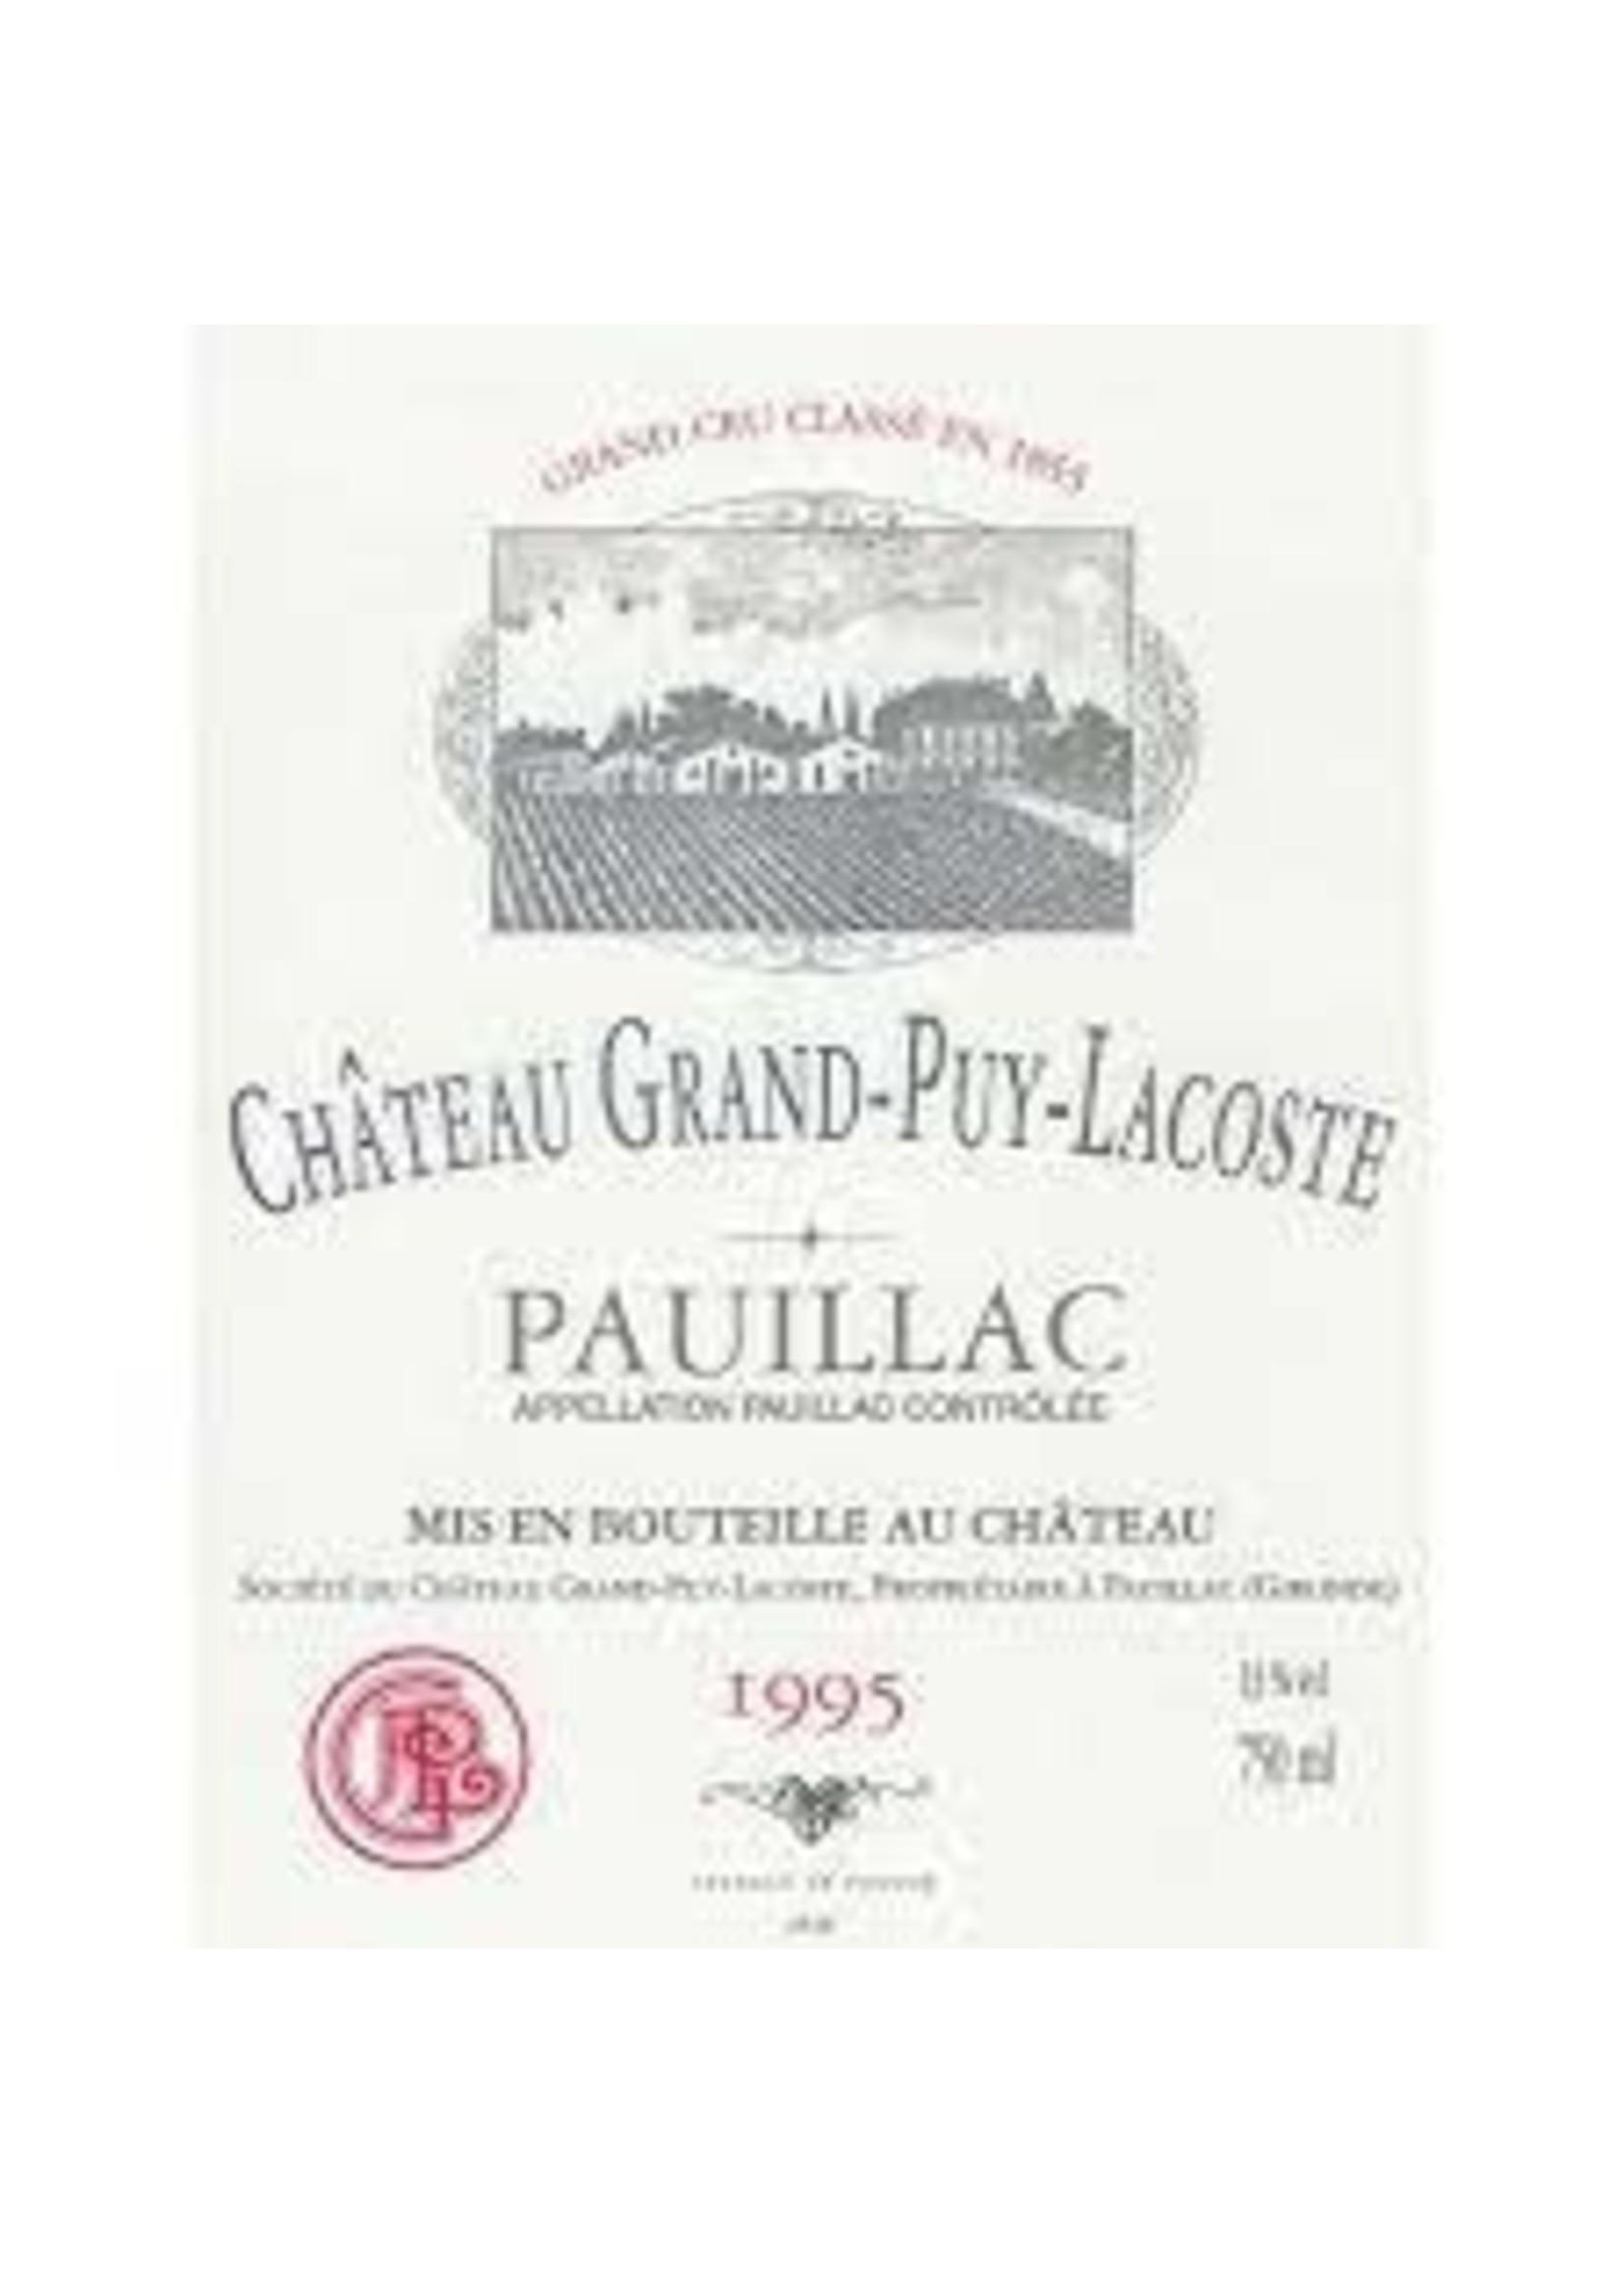 Chateau Grand-Puy-Lacoste 1995 Pauillac 750ml [PRE-ARRIVAL]